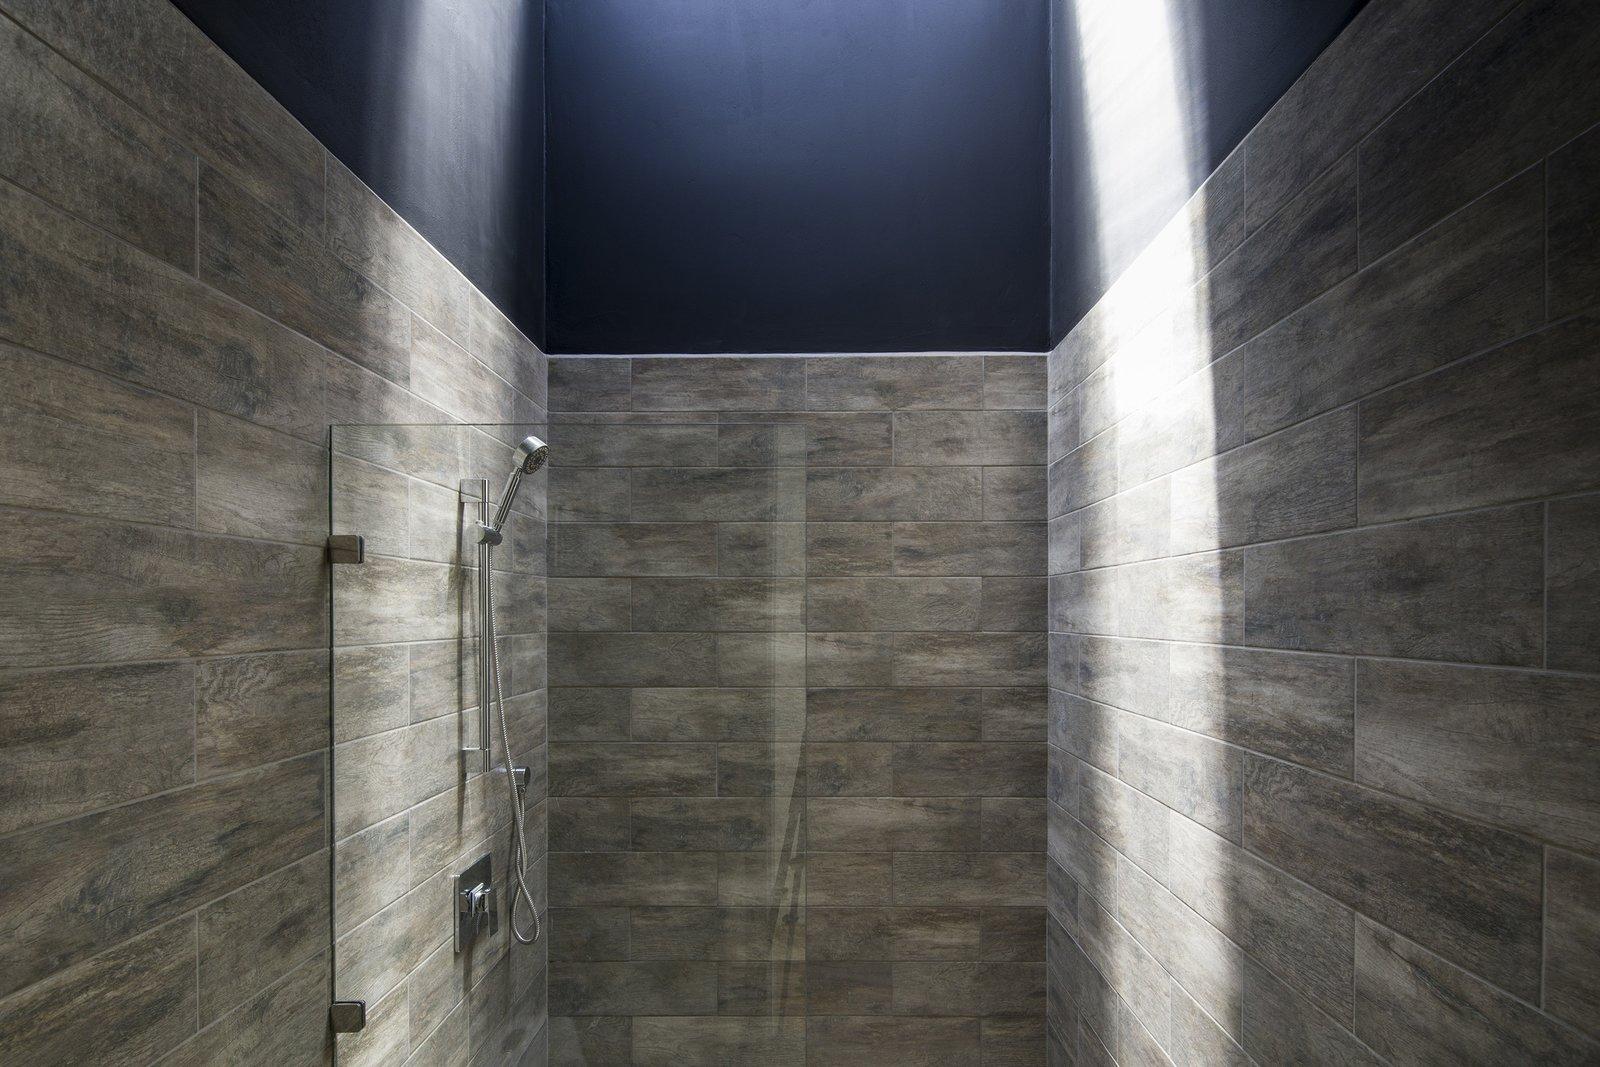 Tagged: Bath Room, Porcelain Tile Floor, Porcelain Tile Wall, Corner Shower, and Open Shower.  Casa Ching by MG design studio